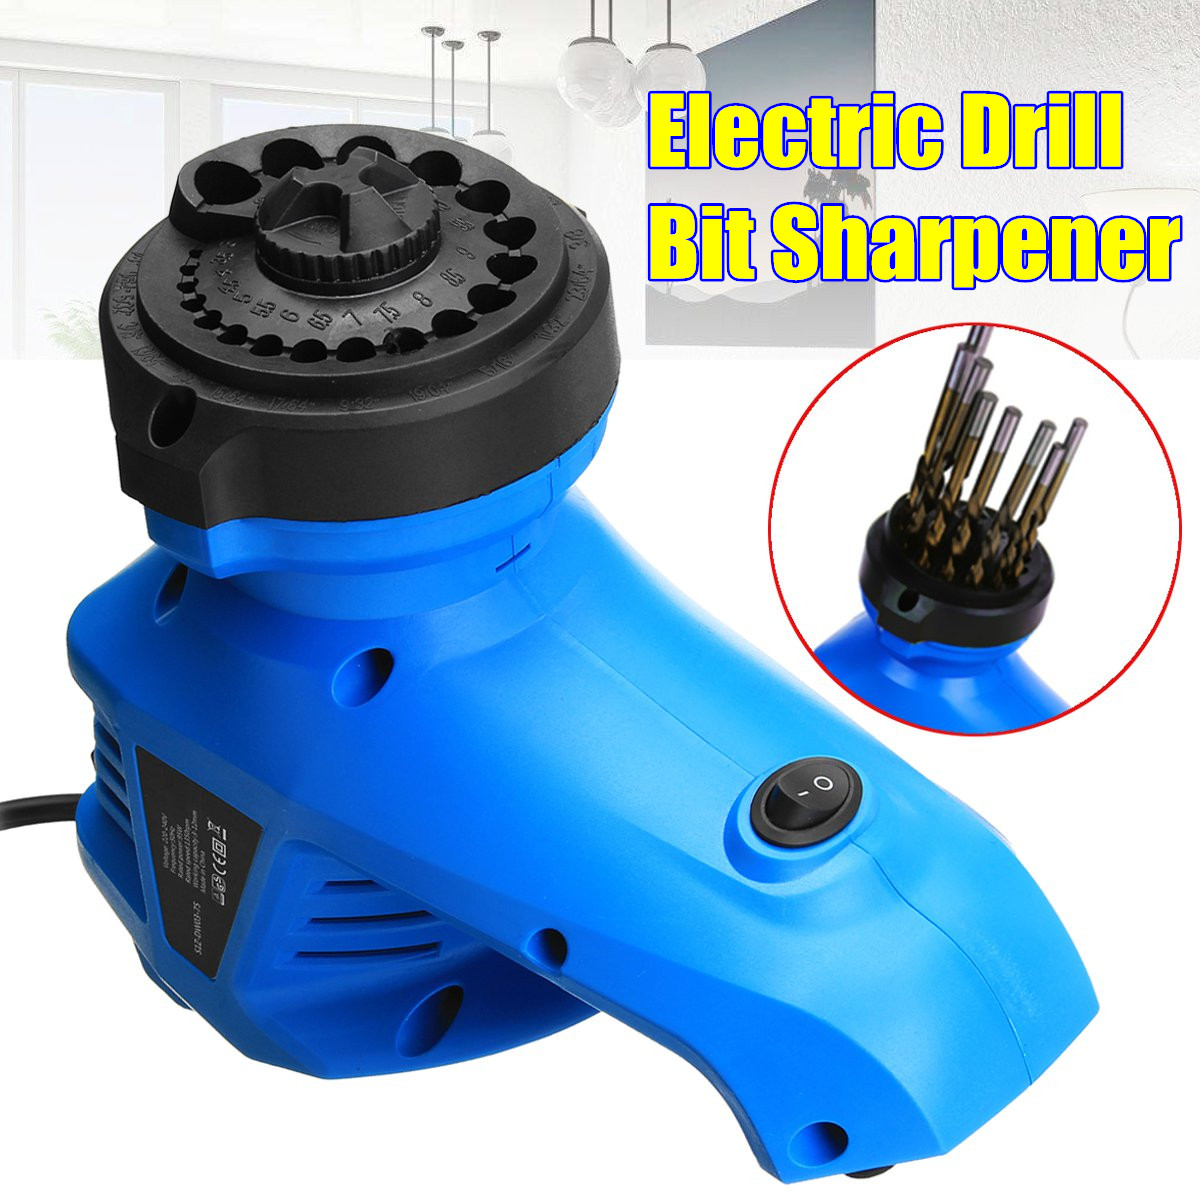 3-12MM Electric Multi Grinding Tool Rotary Machine Twist Drill Bit Sharpener 95W3-12MM Electric Multi Grinding Tool Rotary Machine Twist Drill Bit Sharpener 95W